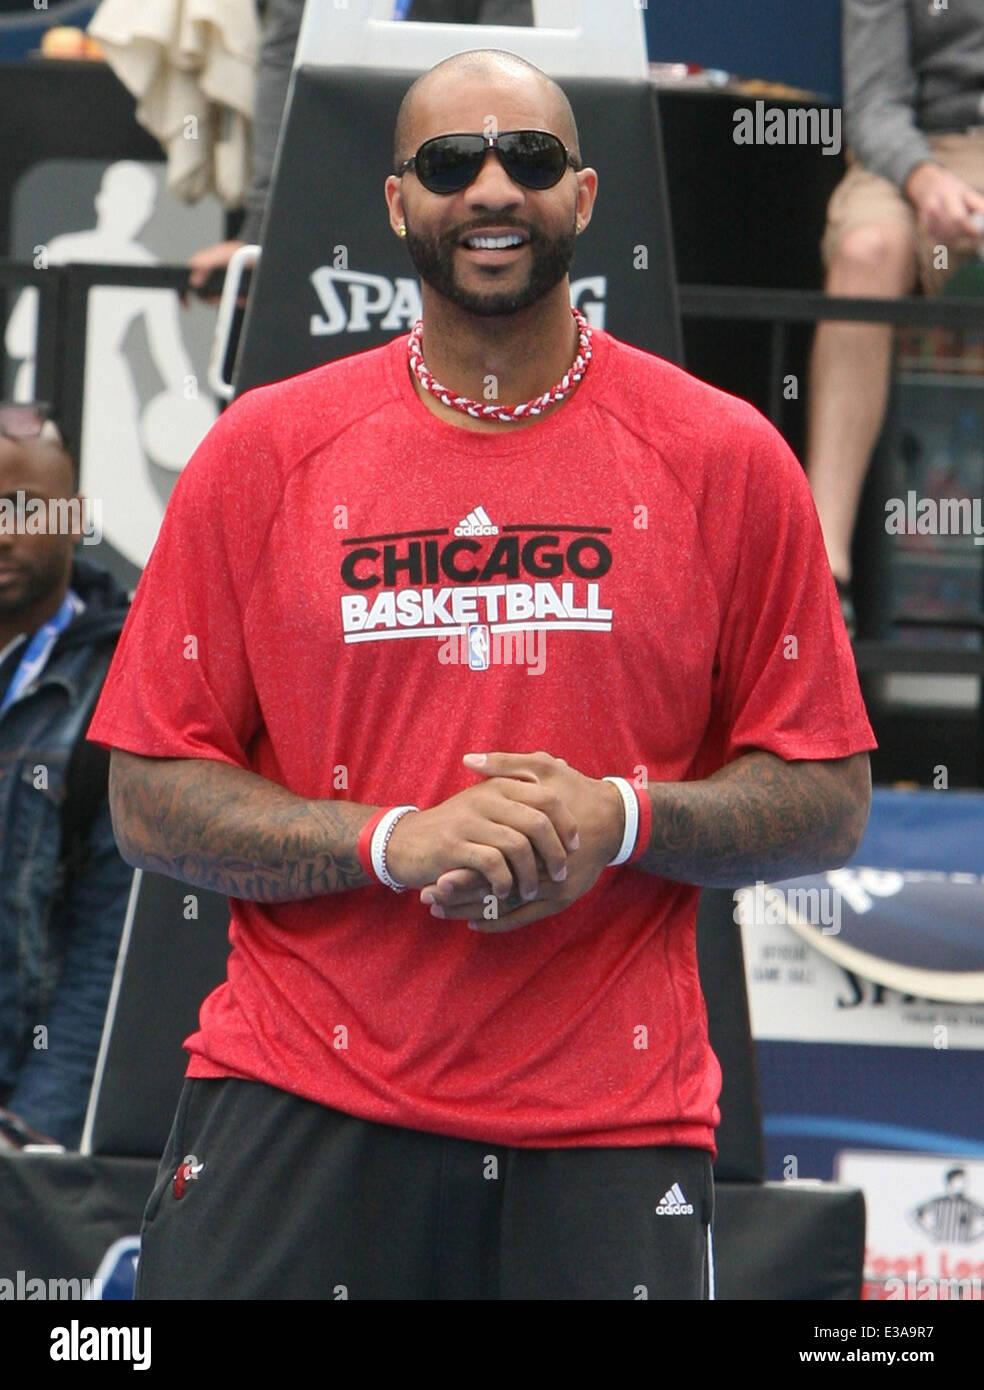 NBA superstar and Chicago Bulls power forward Carlos Boozer hosts